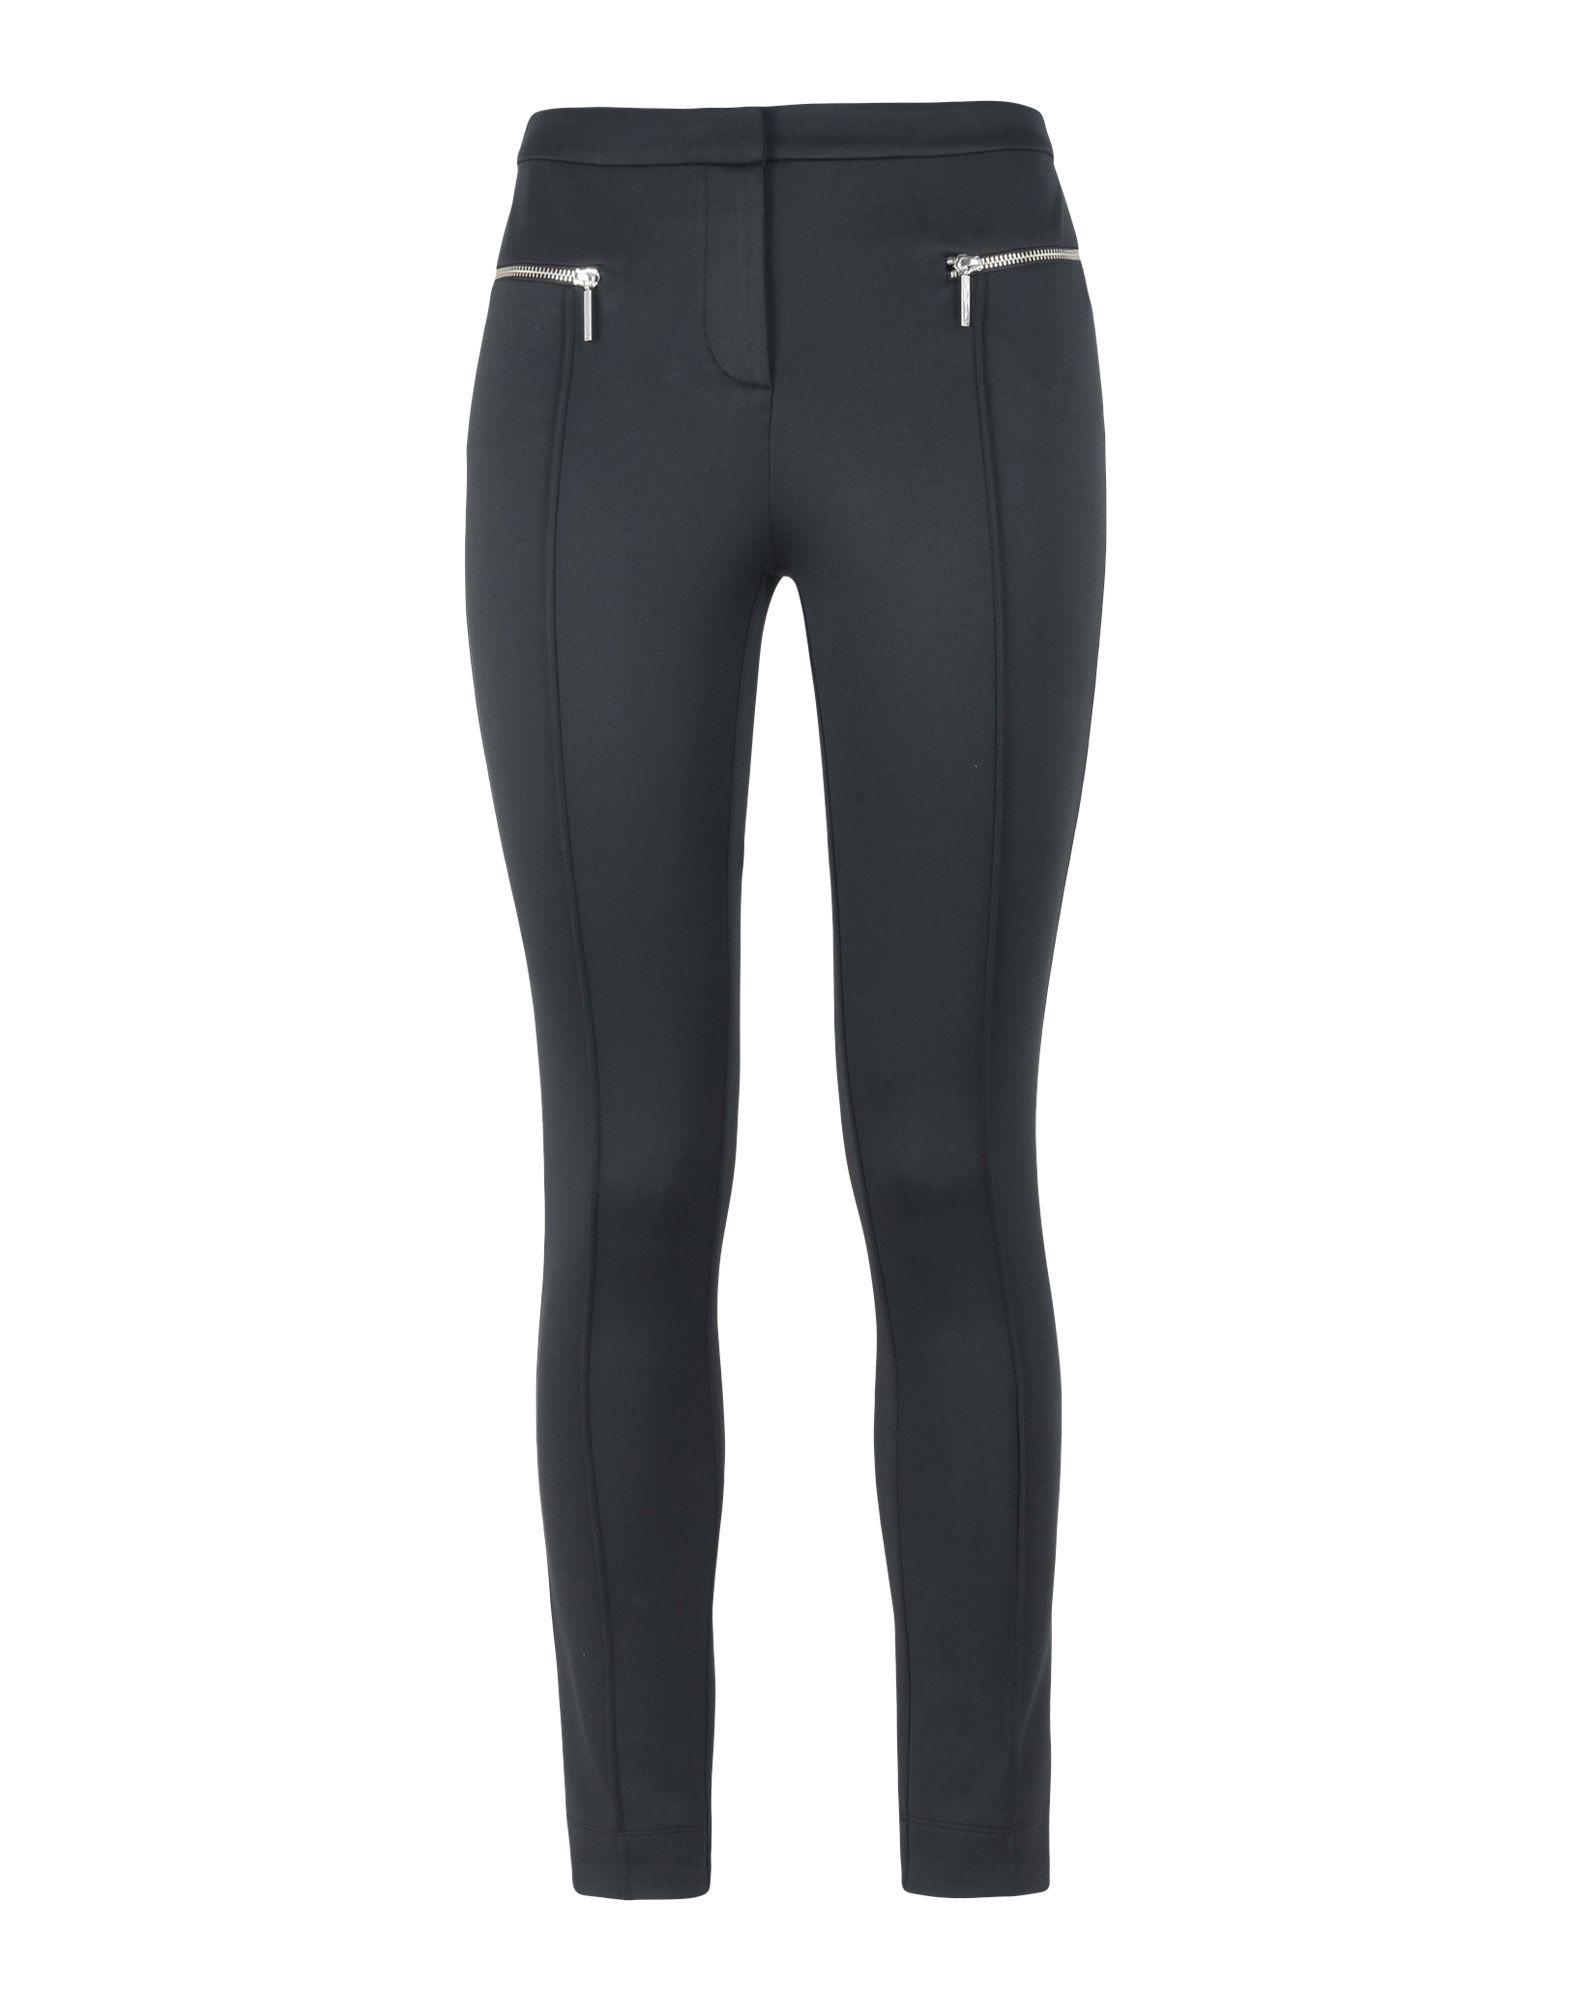 Pantalone Armani Jeans donna - 13165938EF 13165938EF  gute Qualität